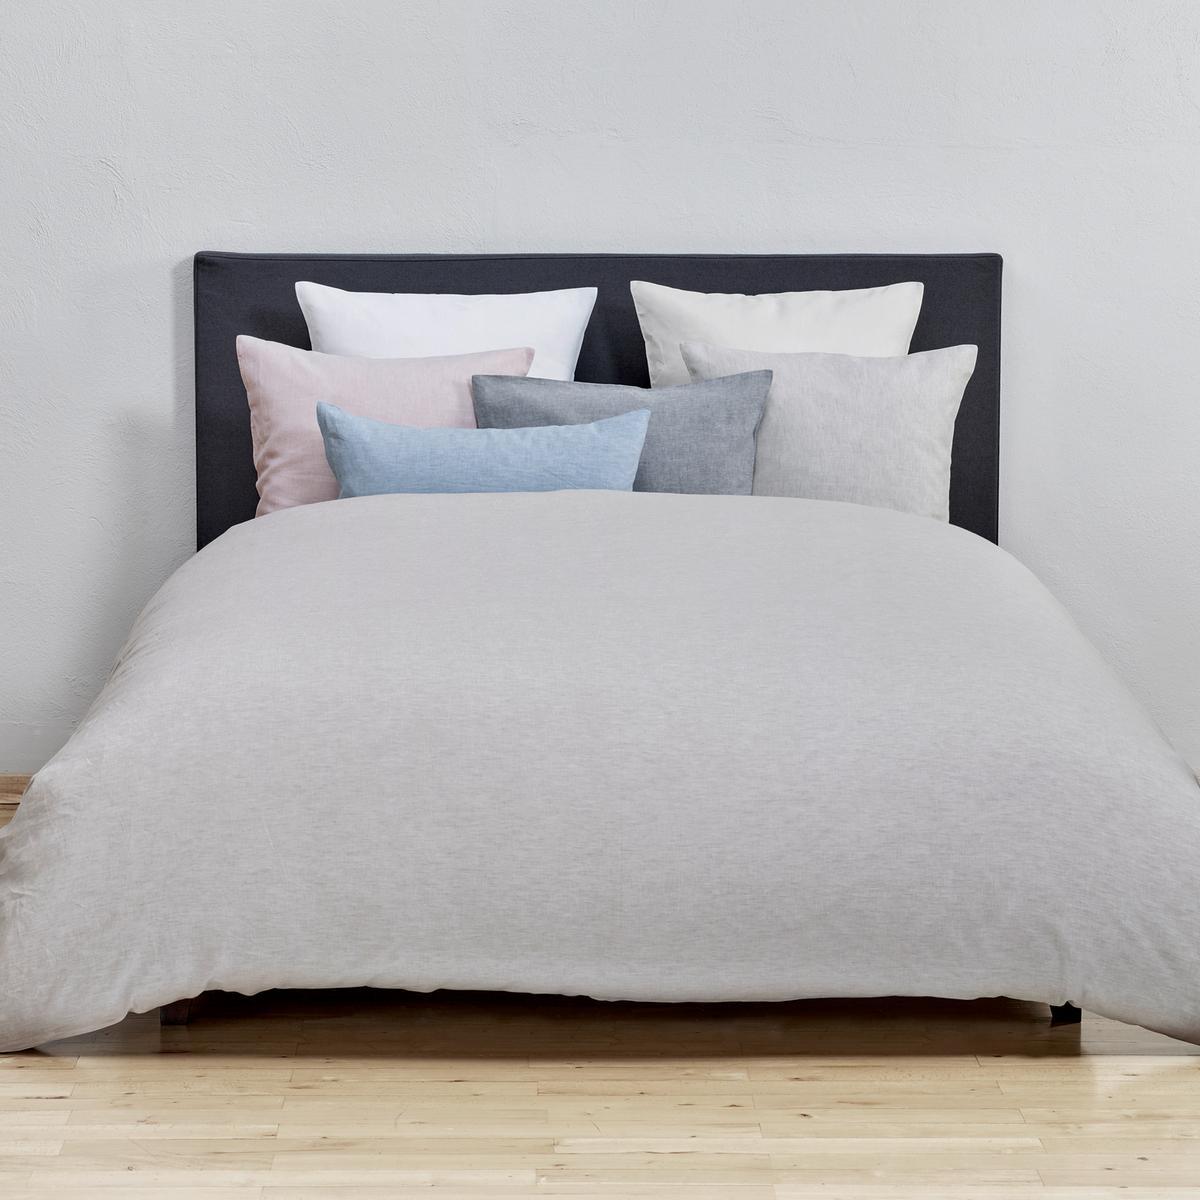 christian fischbacher bettw sche purolino wei. Black Bedroom Furniture Sets. Home Design Ideas